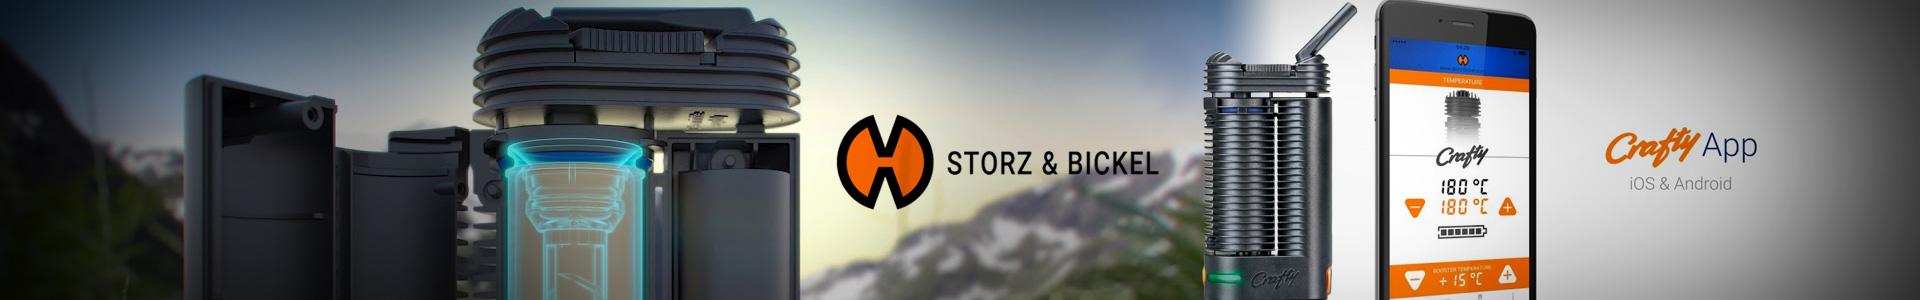 Vaporizador de Ervas Extrato Crafty+ Storz & Bickel